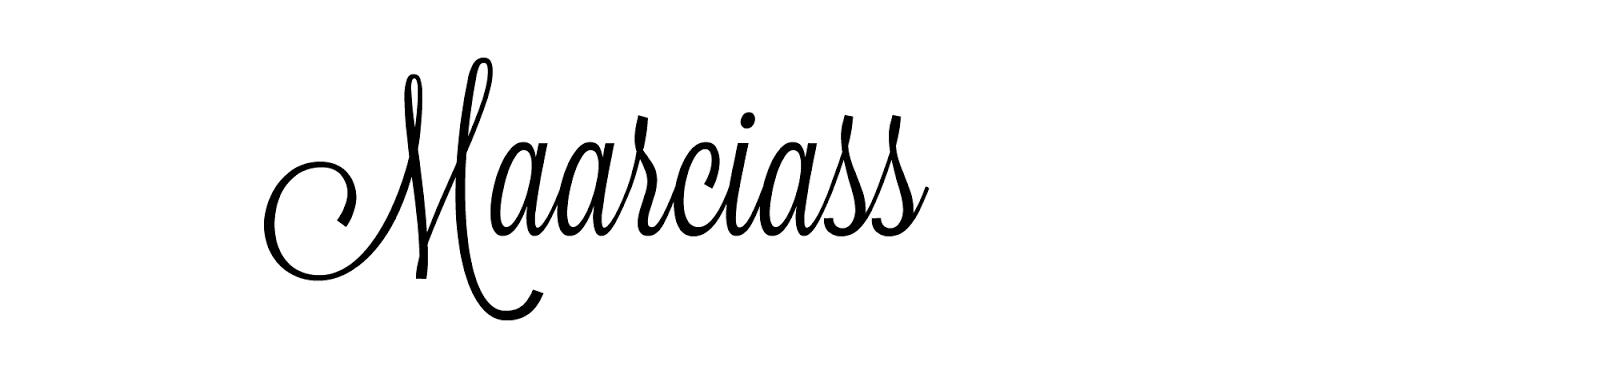 Maarciass